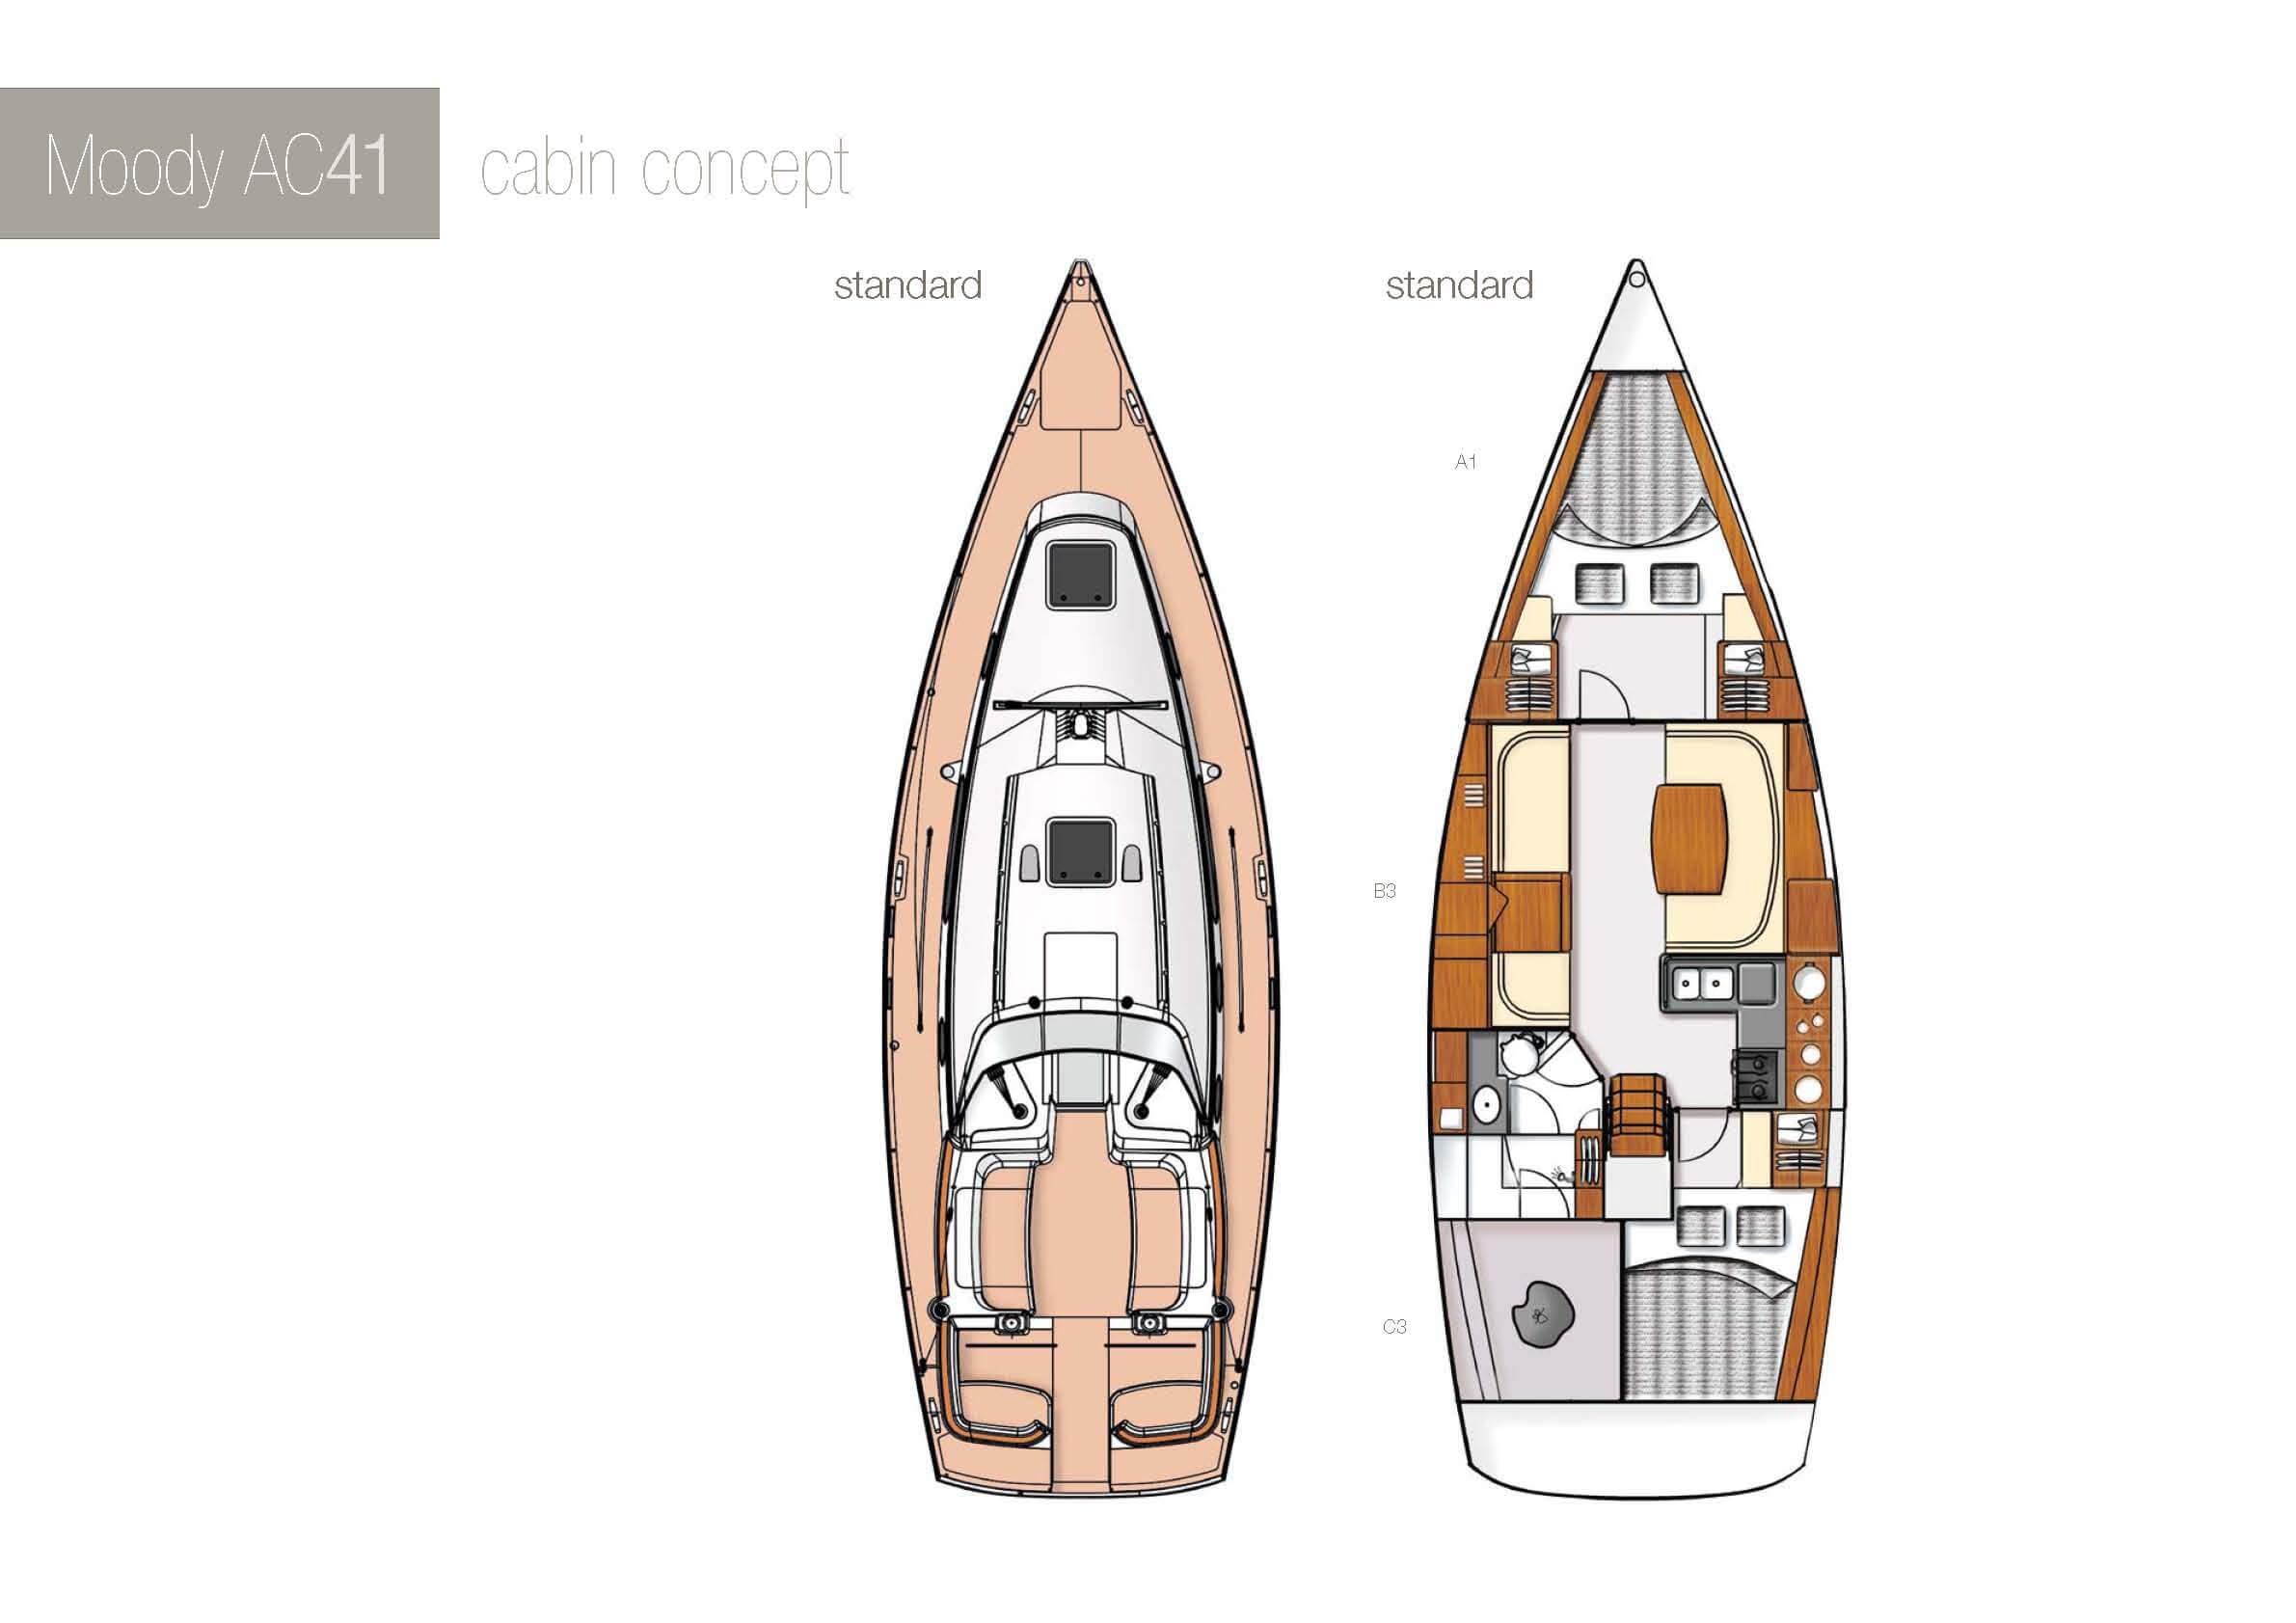 MoodyAC41_cabin_concept_S1